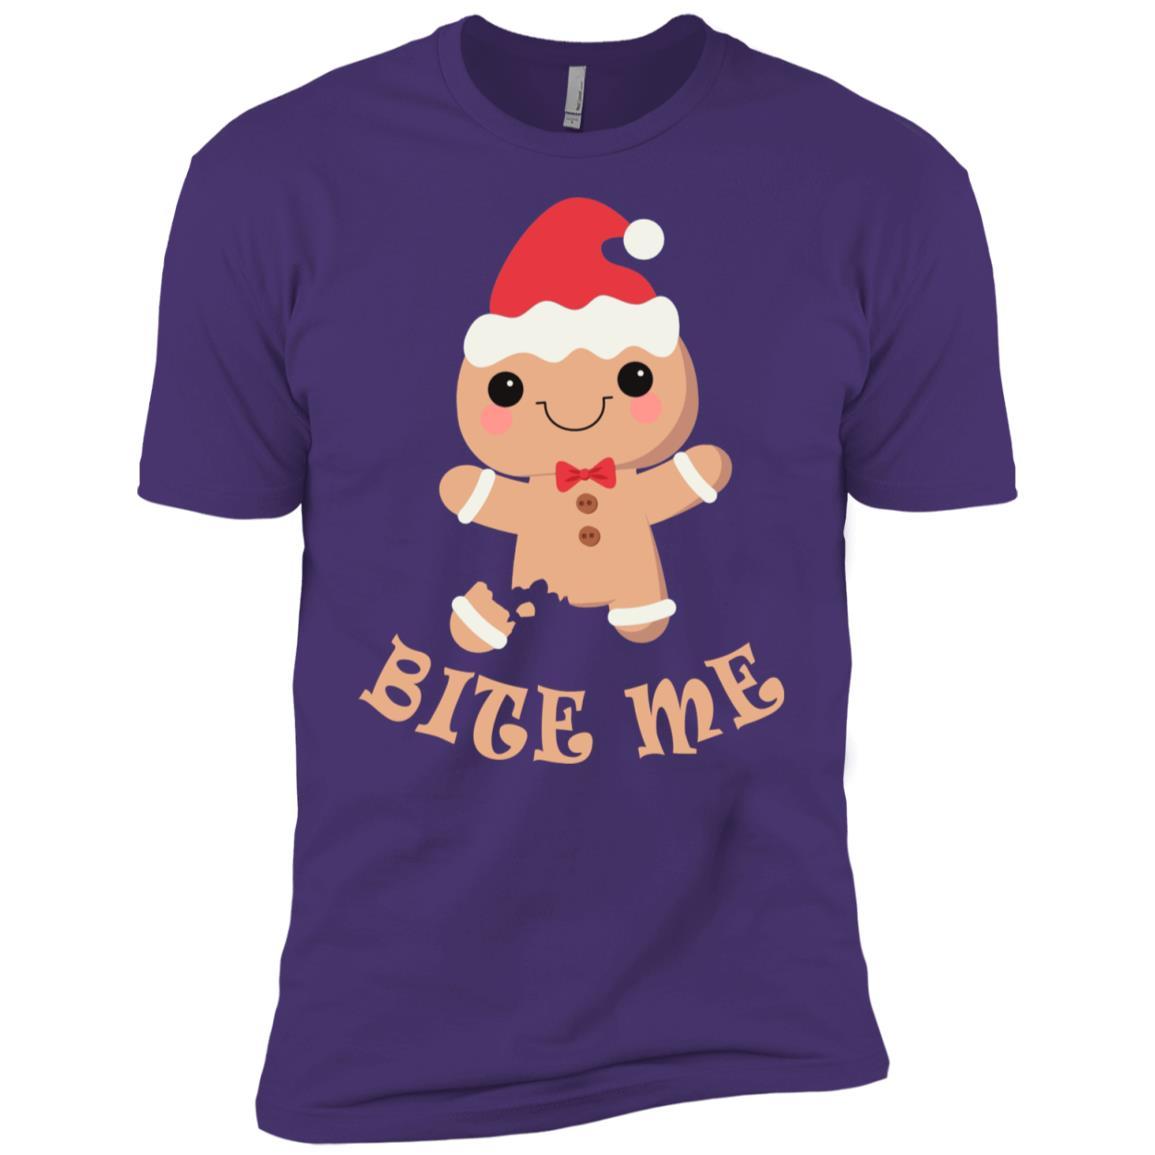 Christmas Bite Me Gingerbread – Funny Christmas Tee Men Short Sleeve T-Shirt